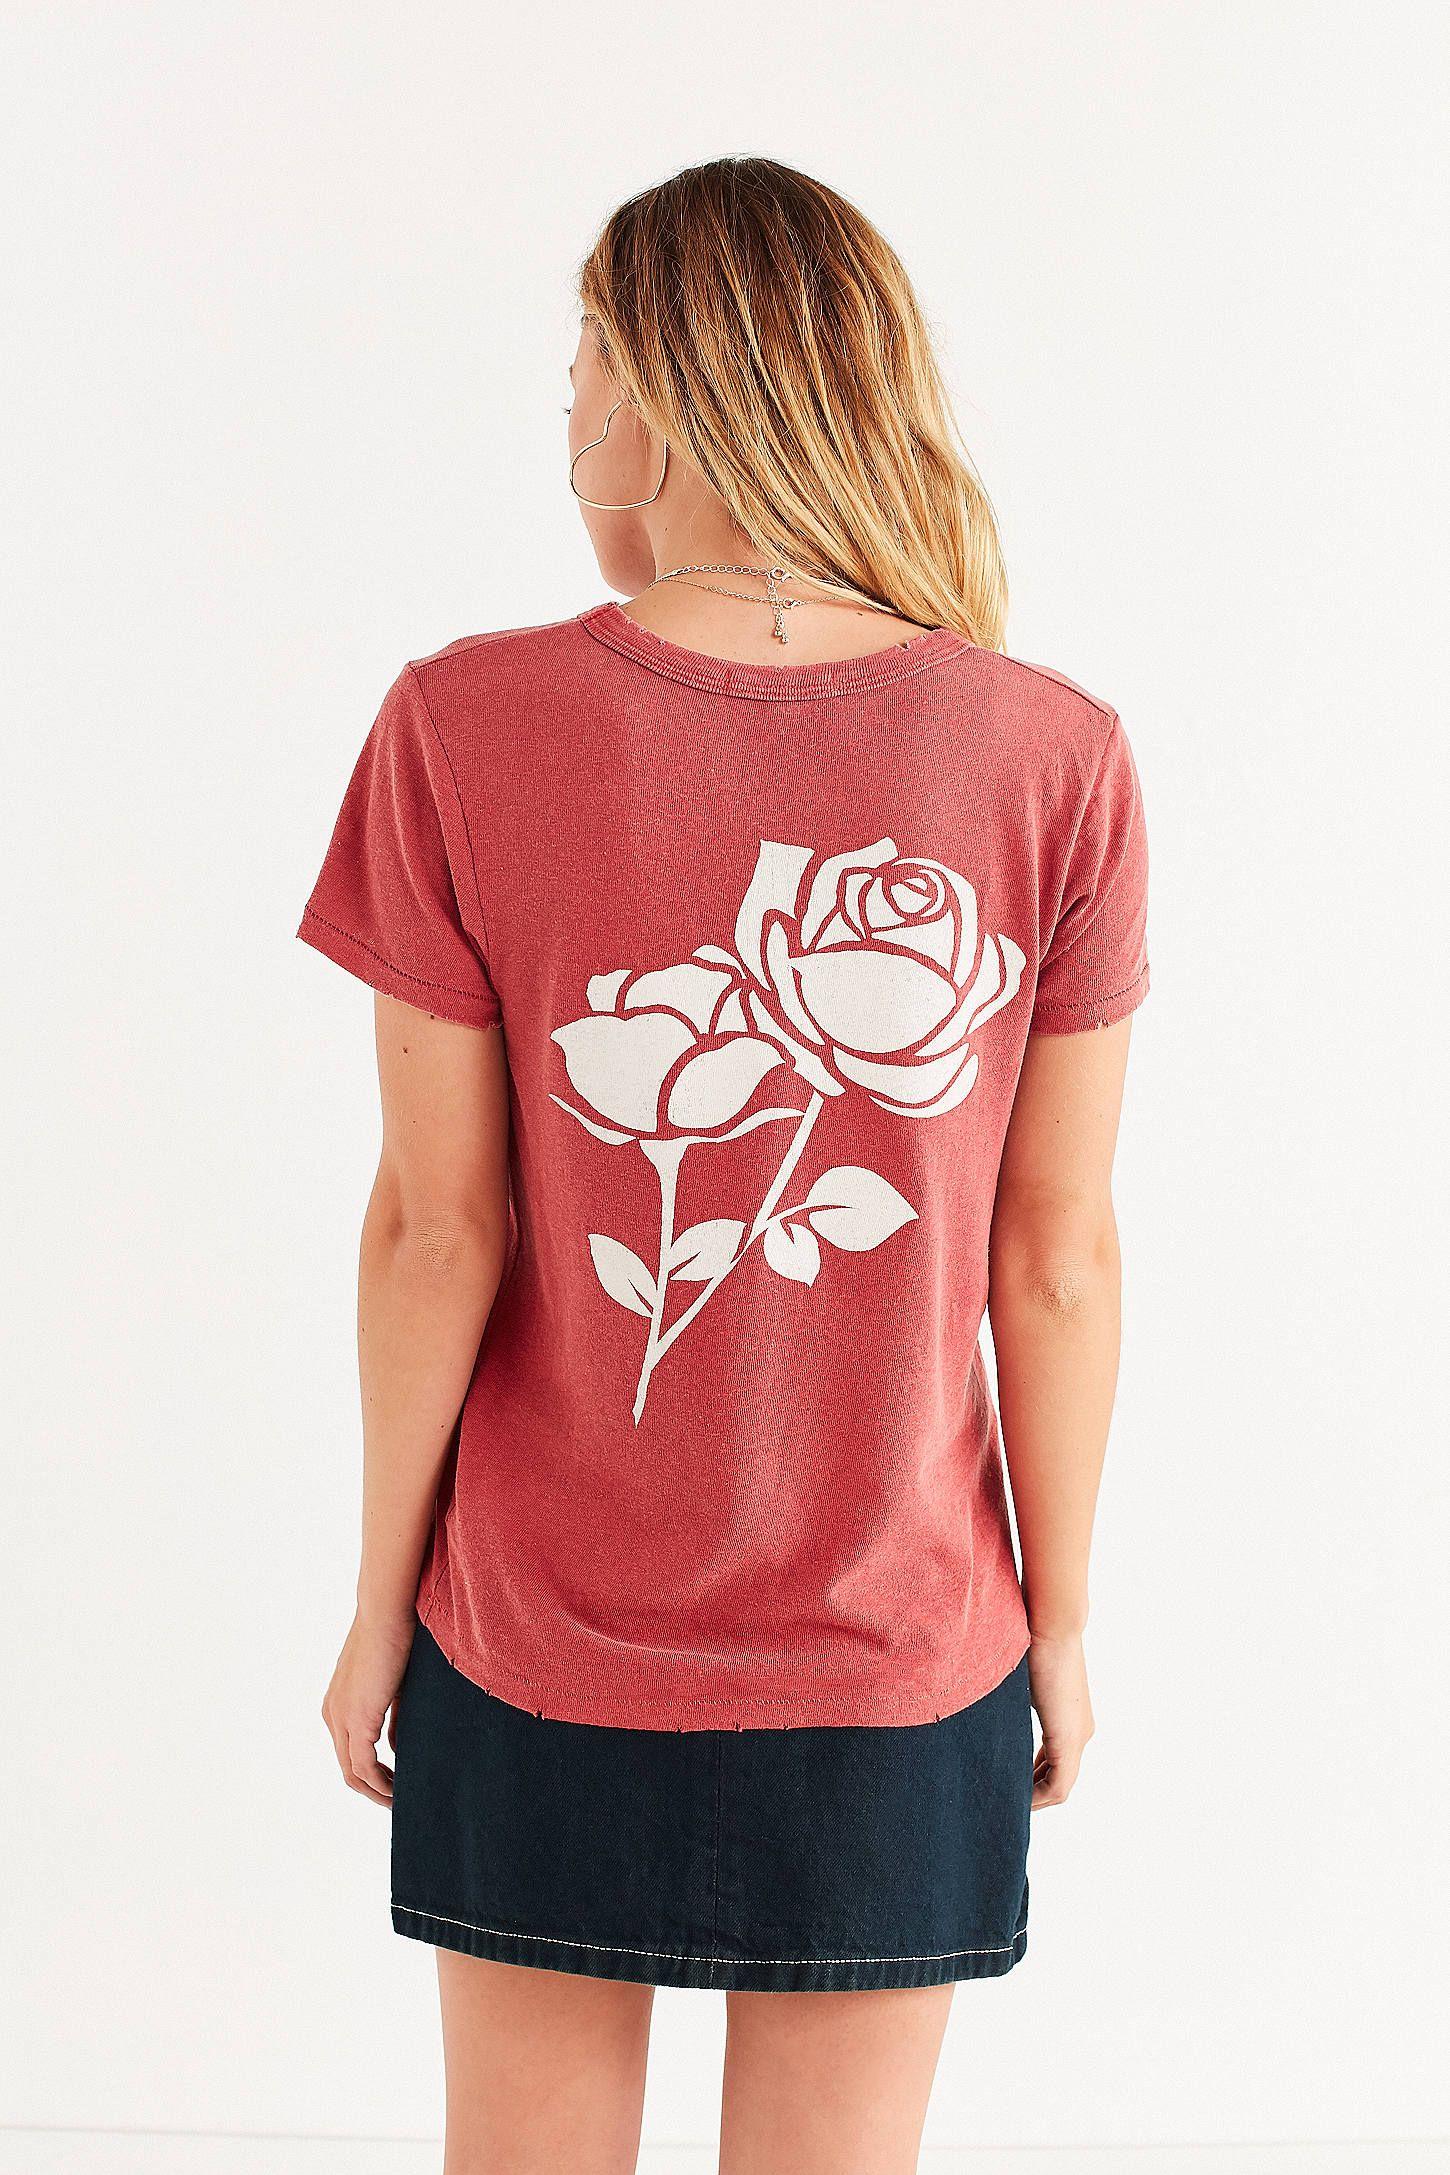 Flower back Sartorial inspiration Pinterest Fashion